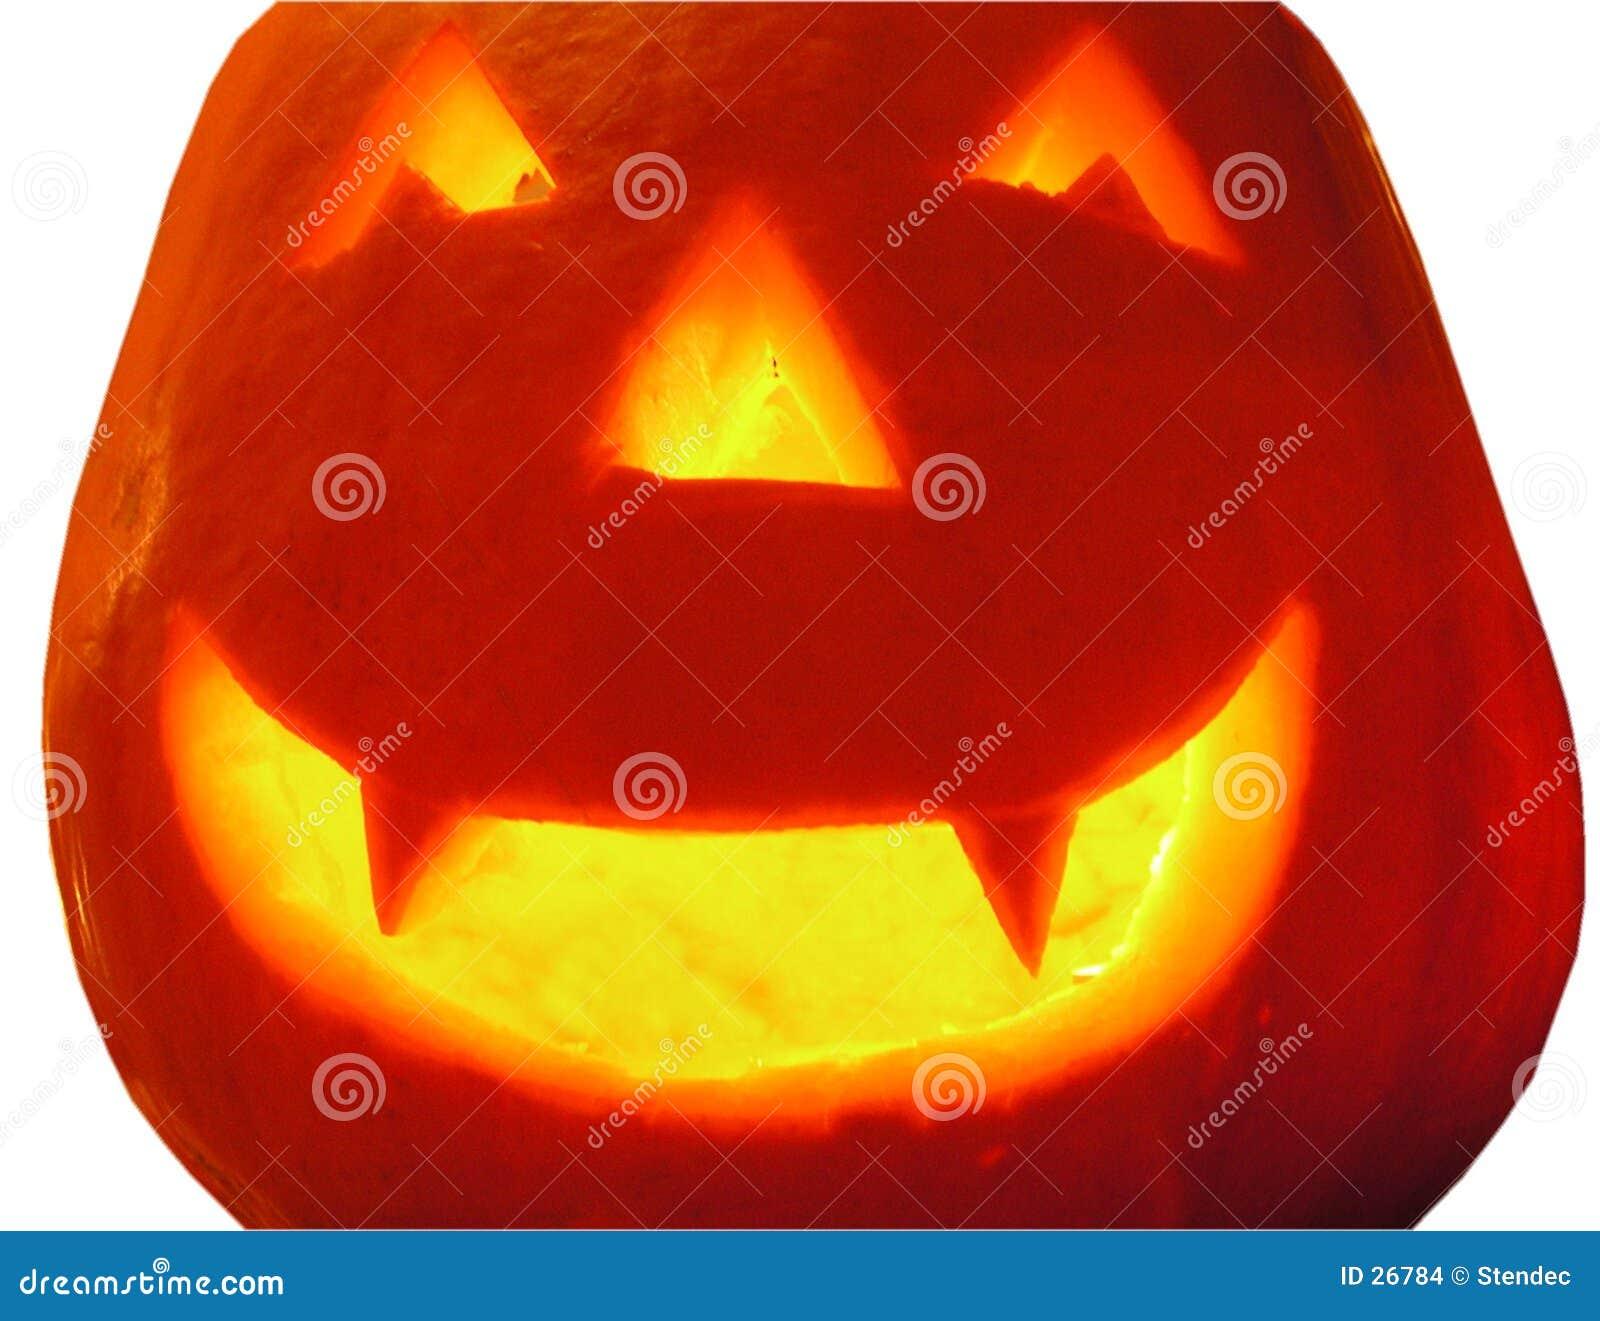 A Hallowe en Pumpkin